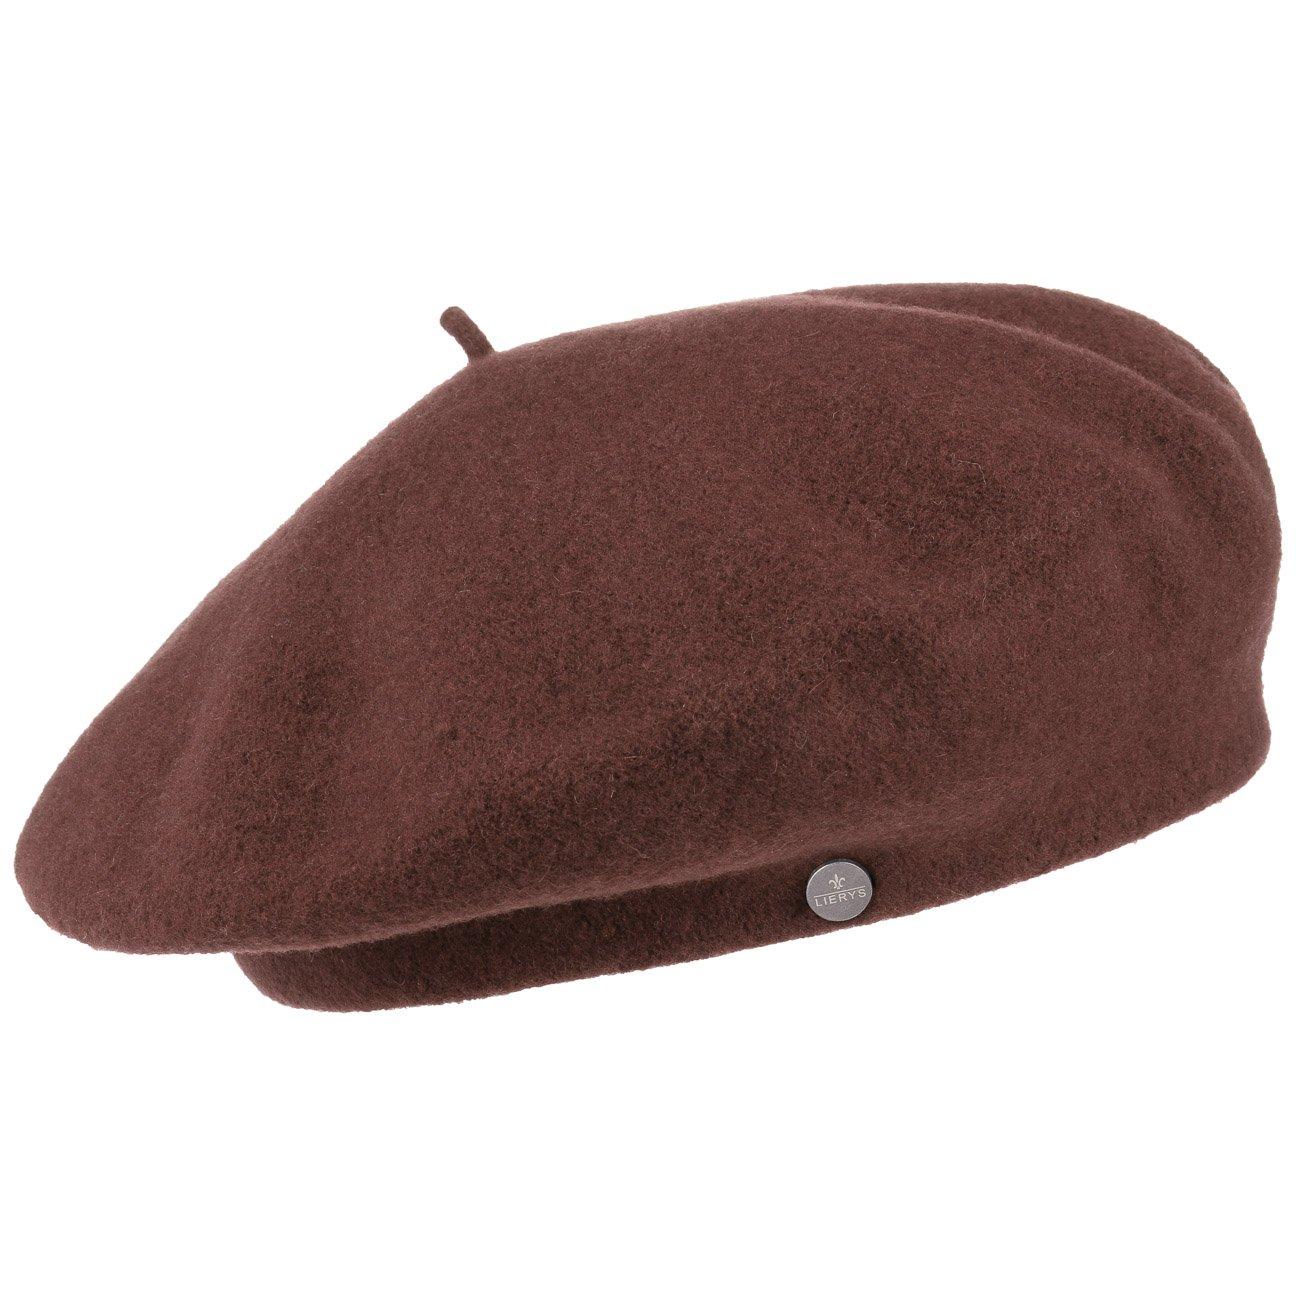 Lierys Ladies' Beret | New Wool Ladies' Beret for Autumn/Winter | One Size (ca. 55-59 cm) | Ladies' Wool Beret in French Woollen hat